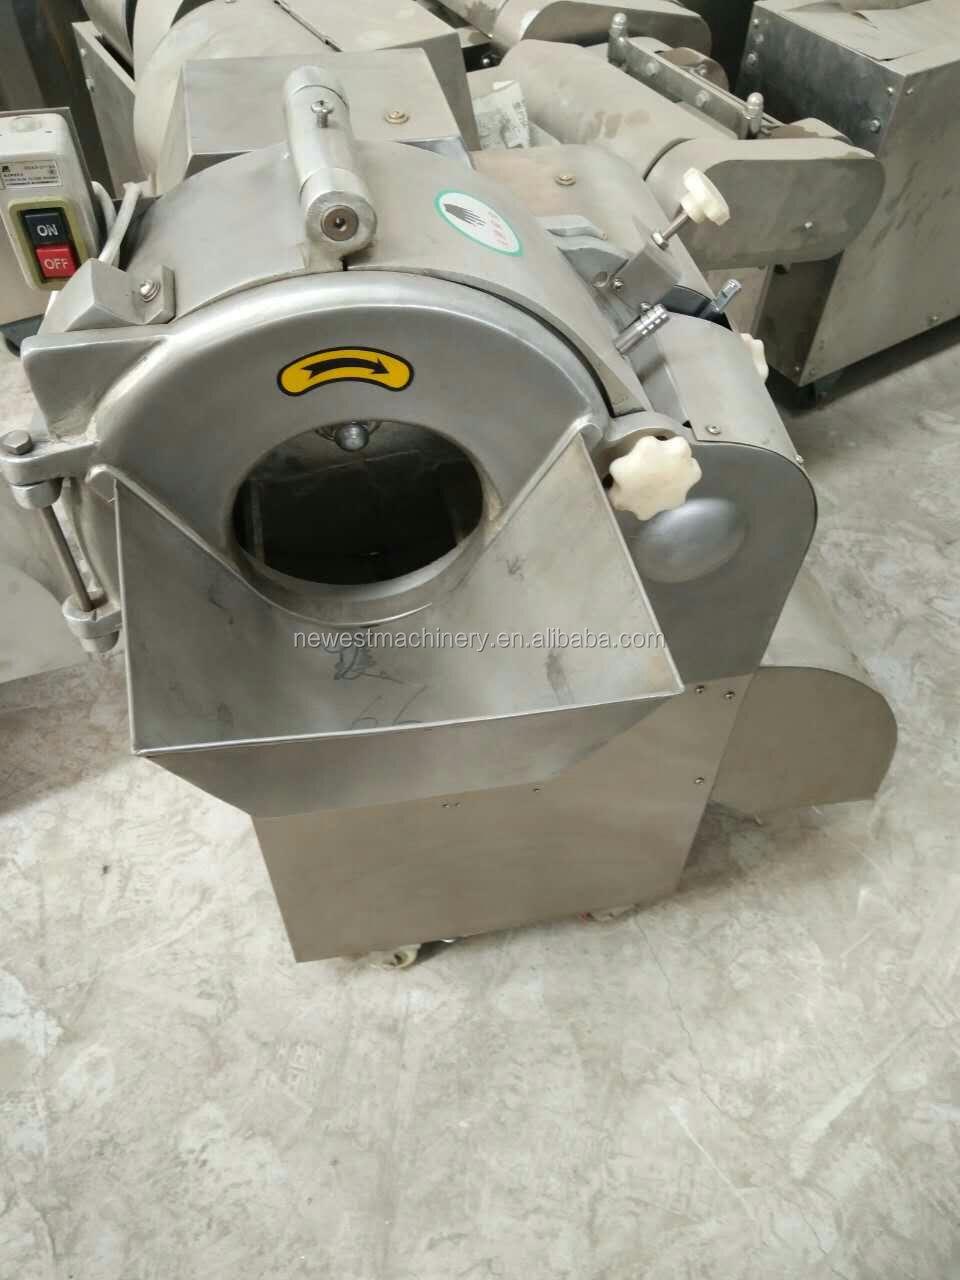 Listrik 200-1000 kg/h mesin dicing kelapa/kelapa cutter/slicer/pemain dadu untuk sayuran dan buah-buahan